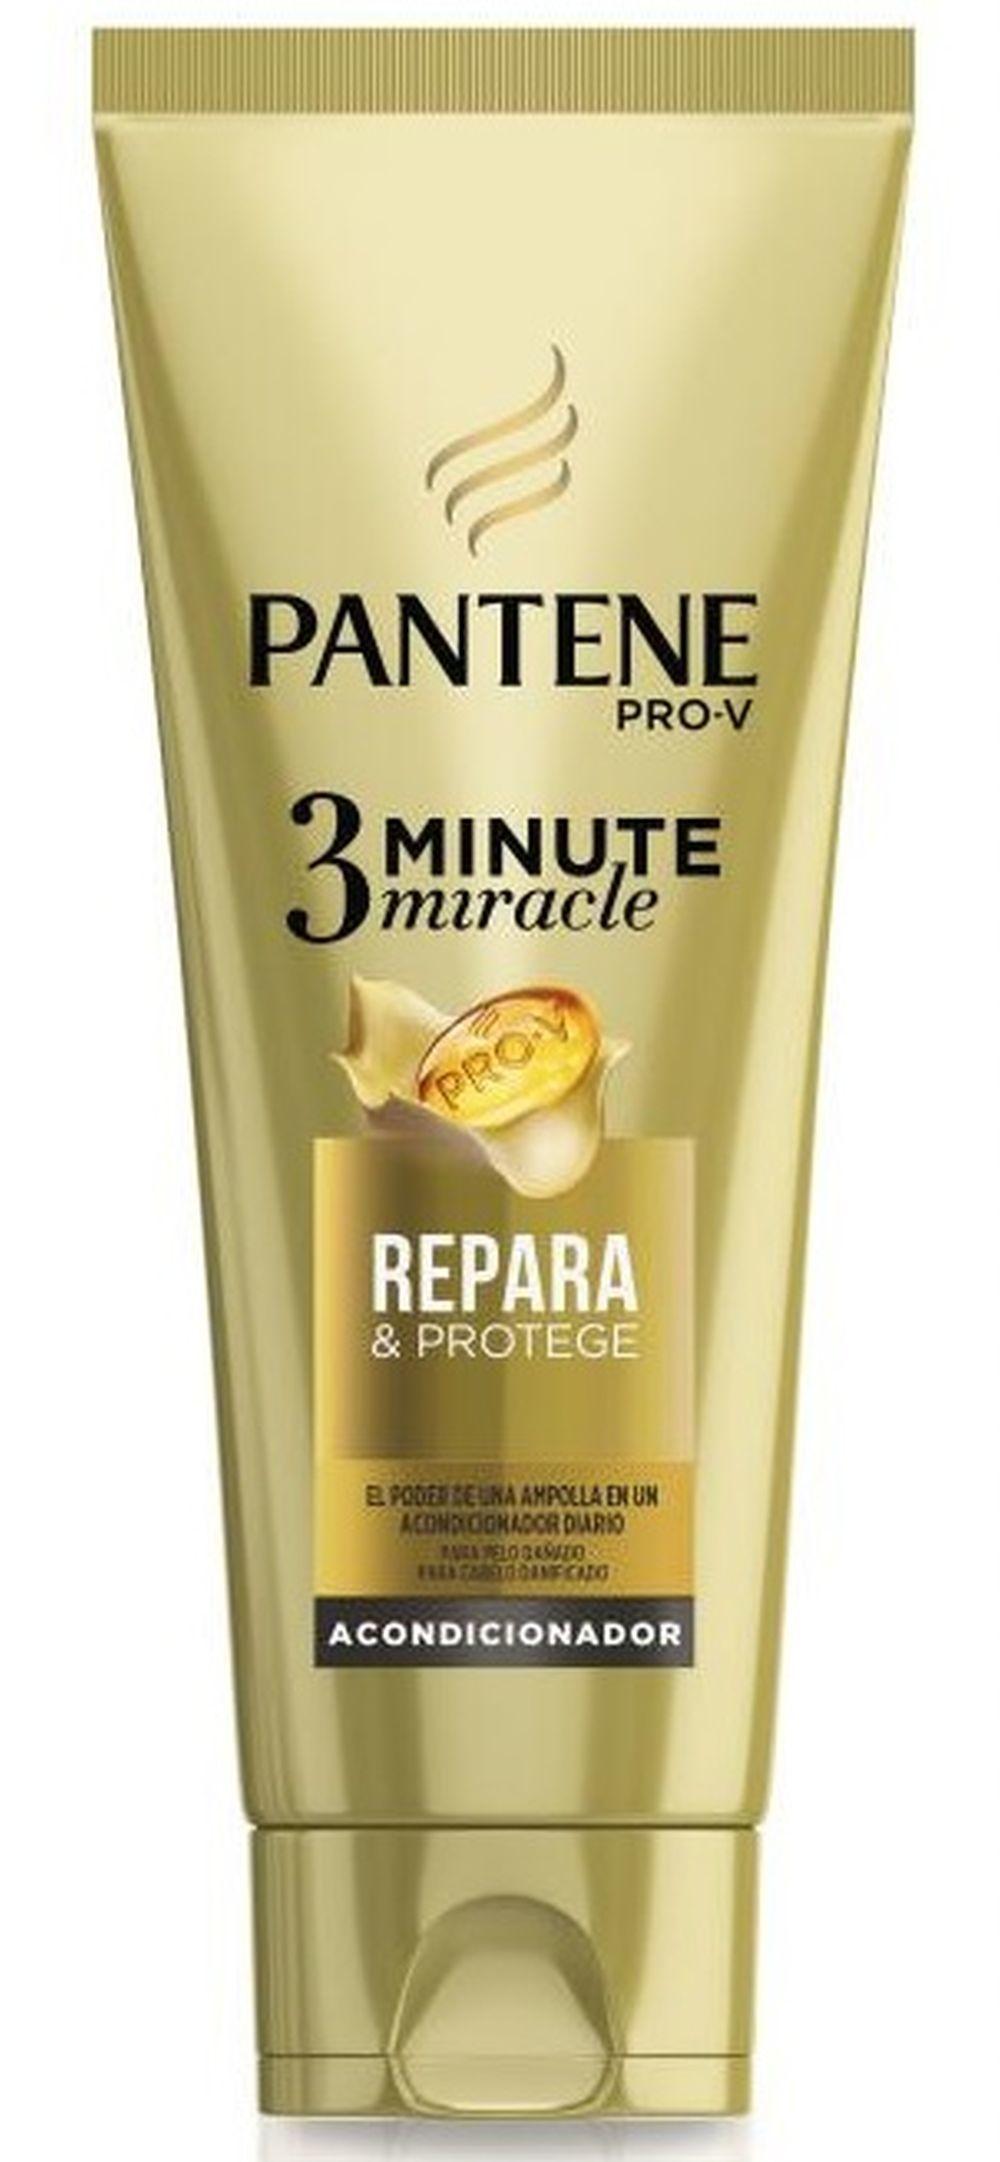 Acondicionador 3 Minute Miracle, Pantene (3,84¤)